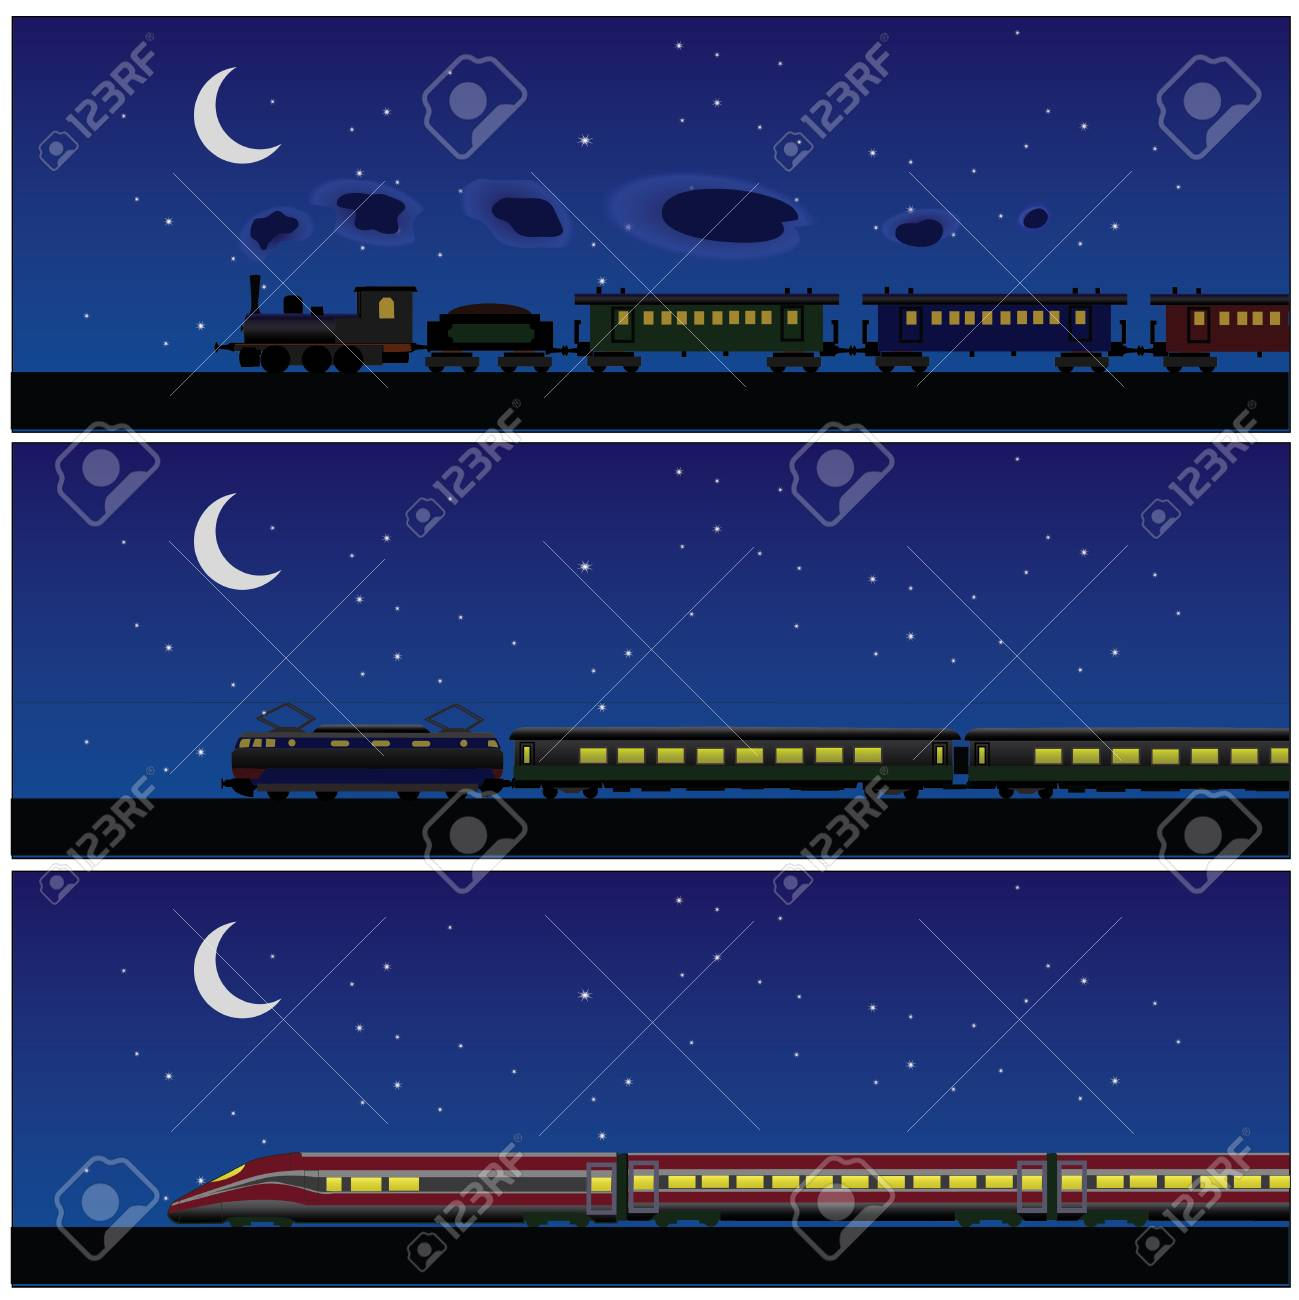 banner train history night - 18295615